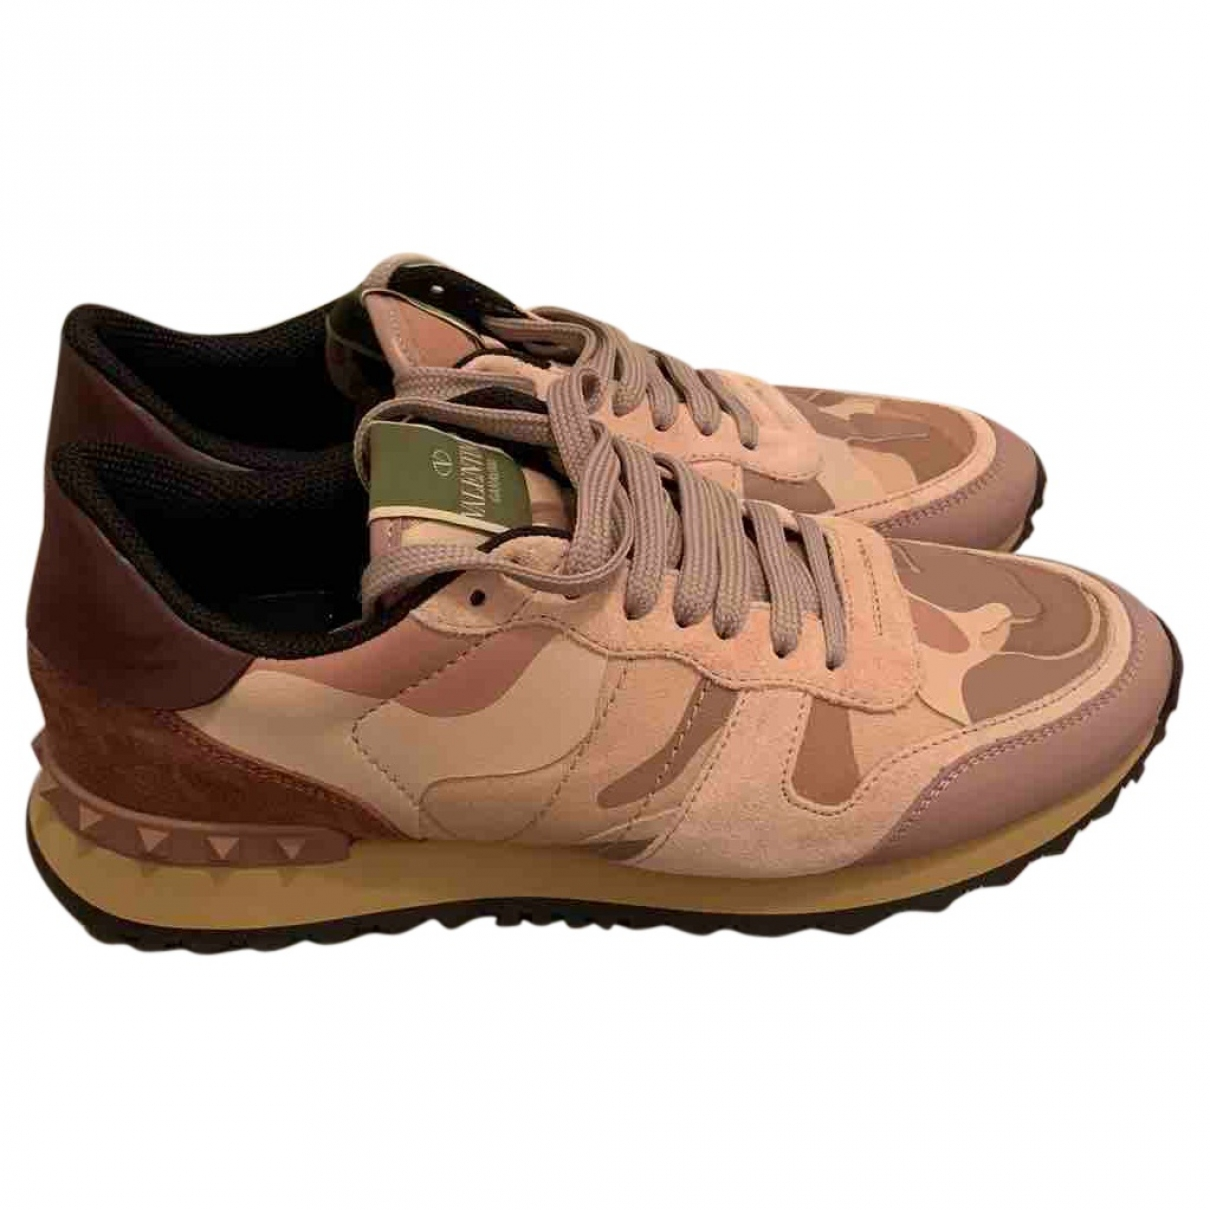 Valentino Garavani Rockrunner Pink Leather Trainers for Women 7 UK